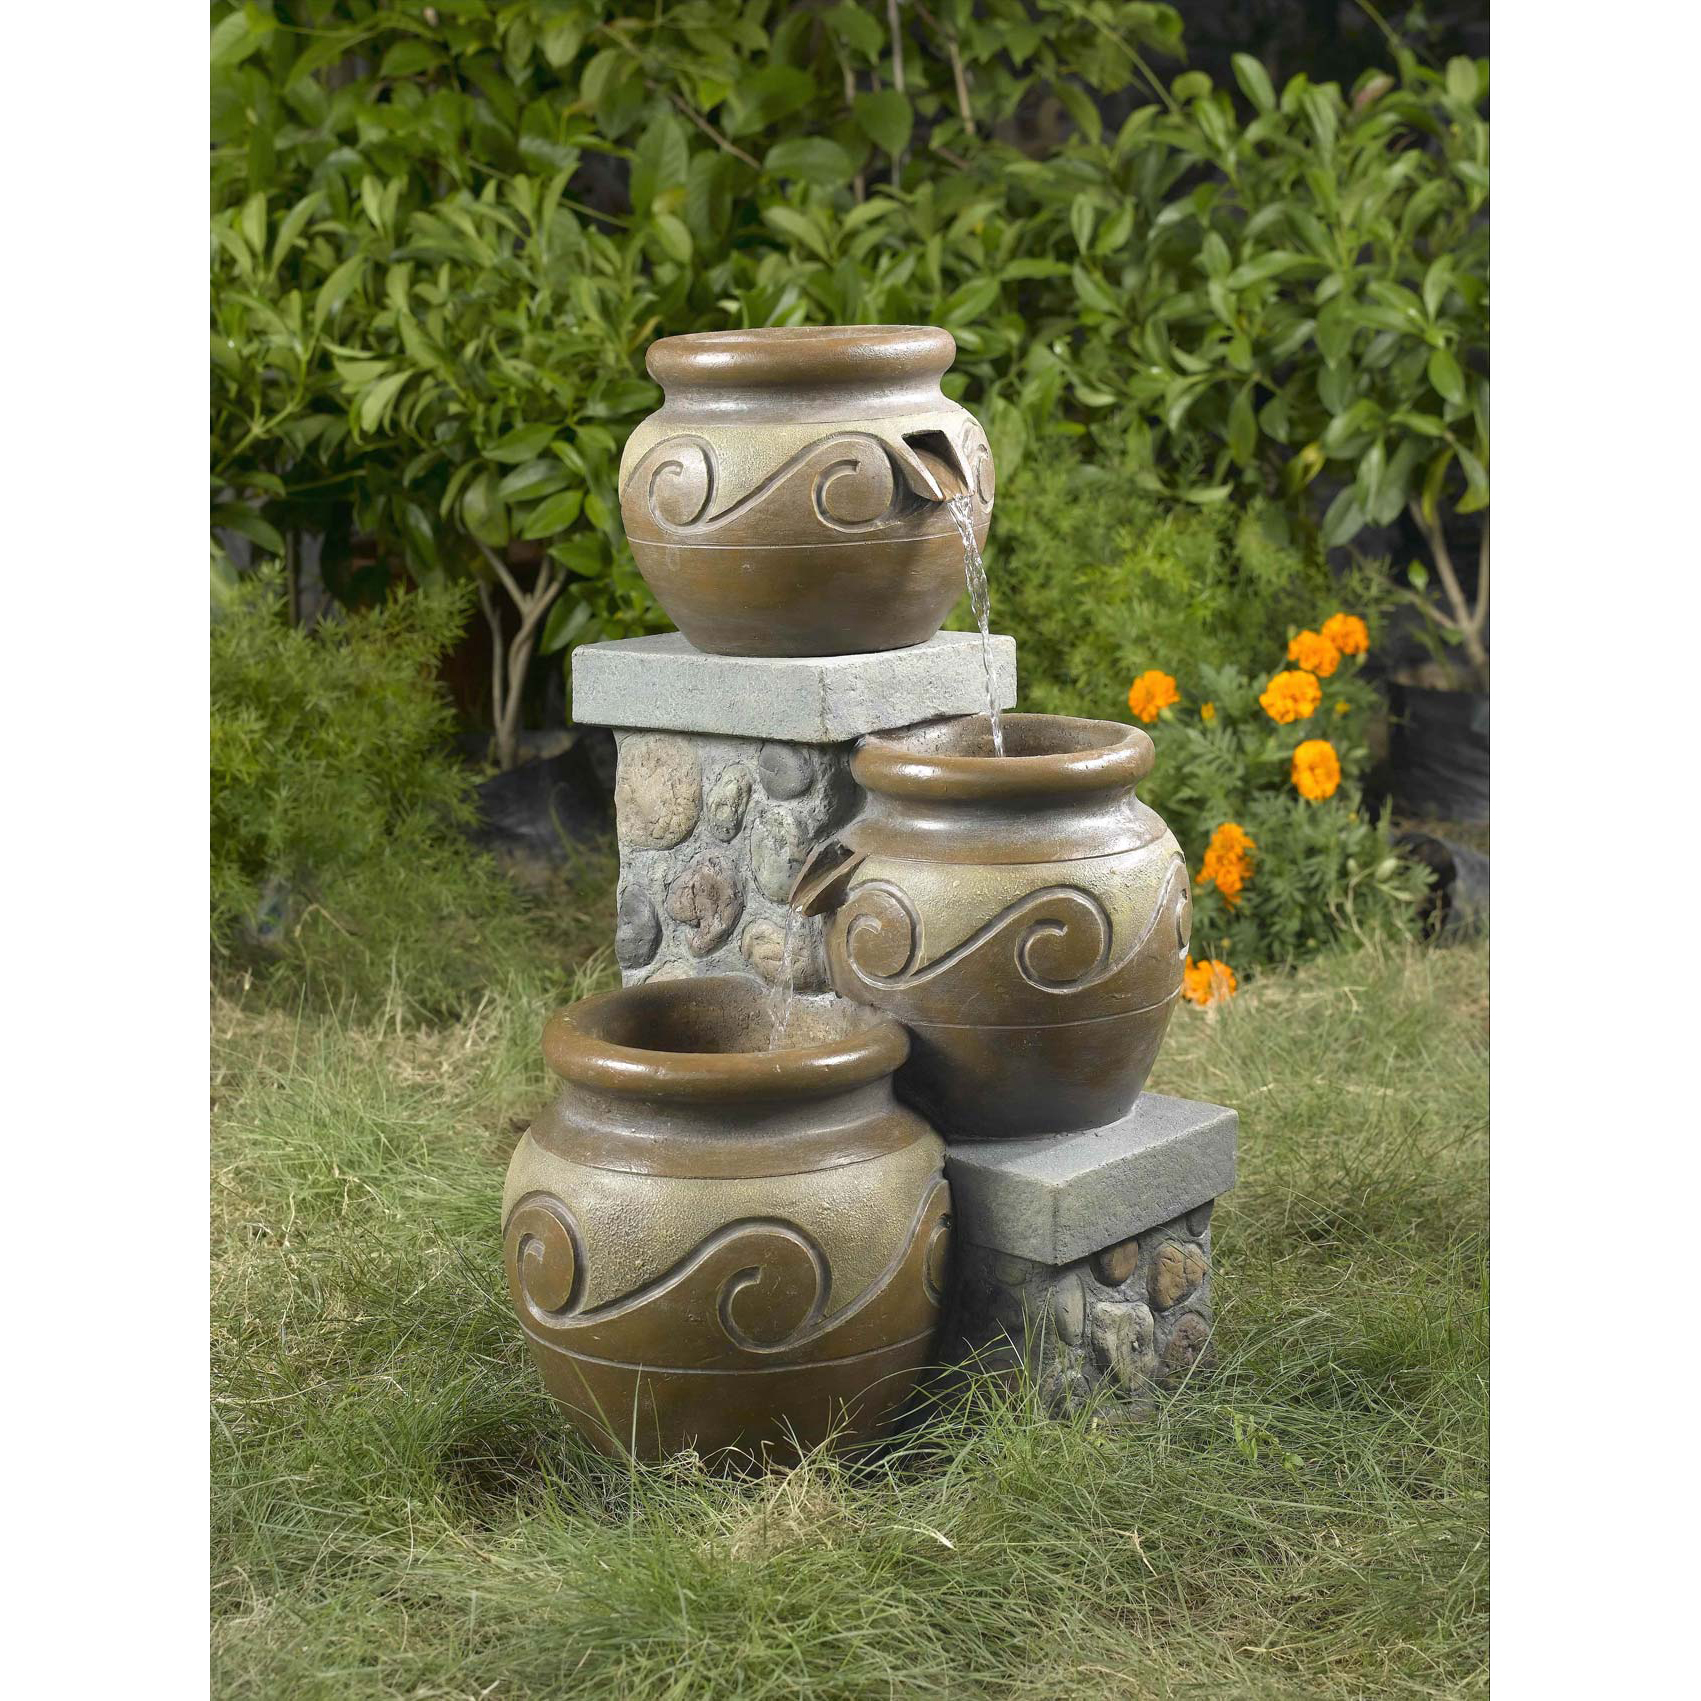 Venice Multi Pot Outdoor Indoor Fountain by